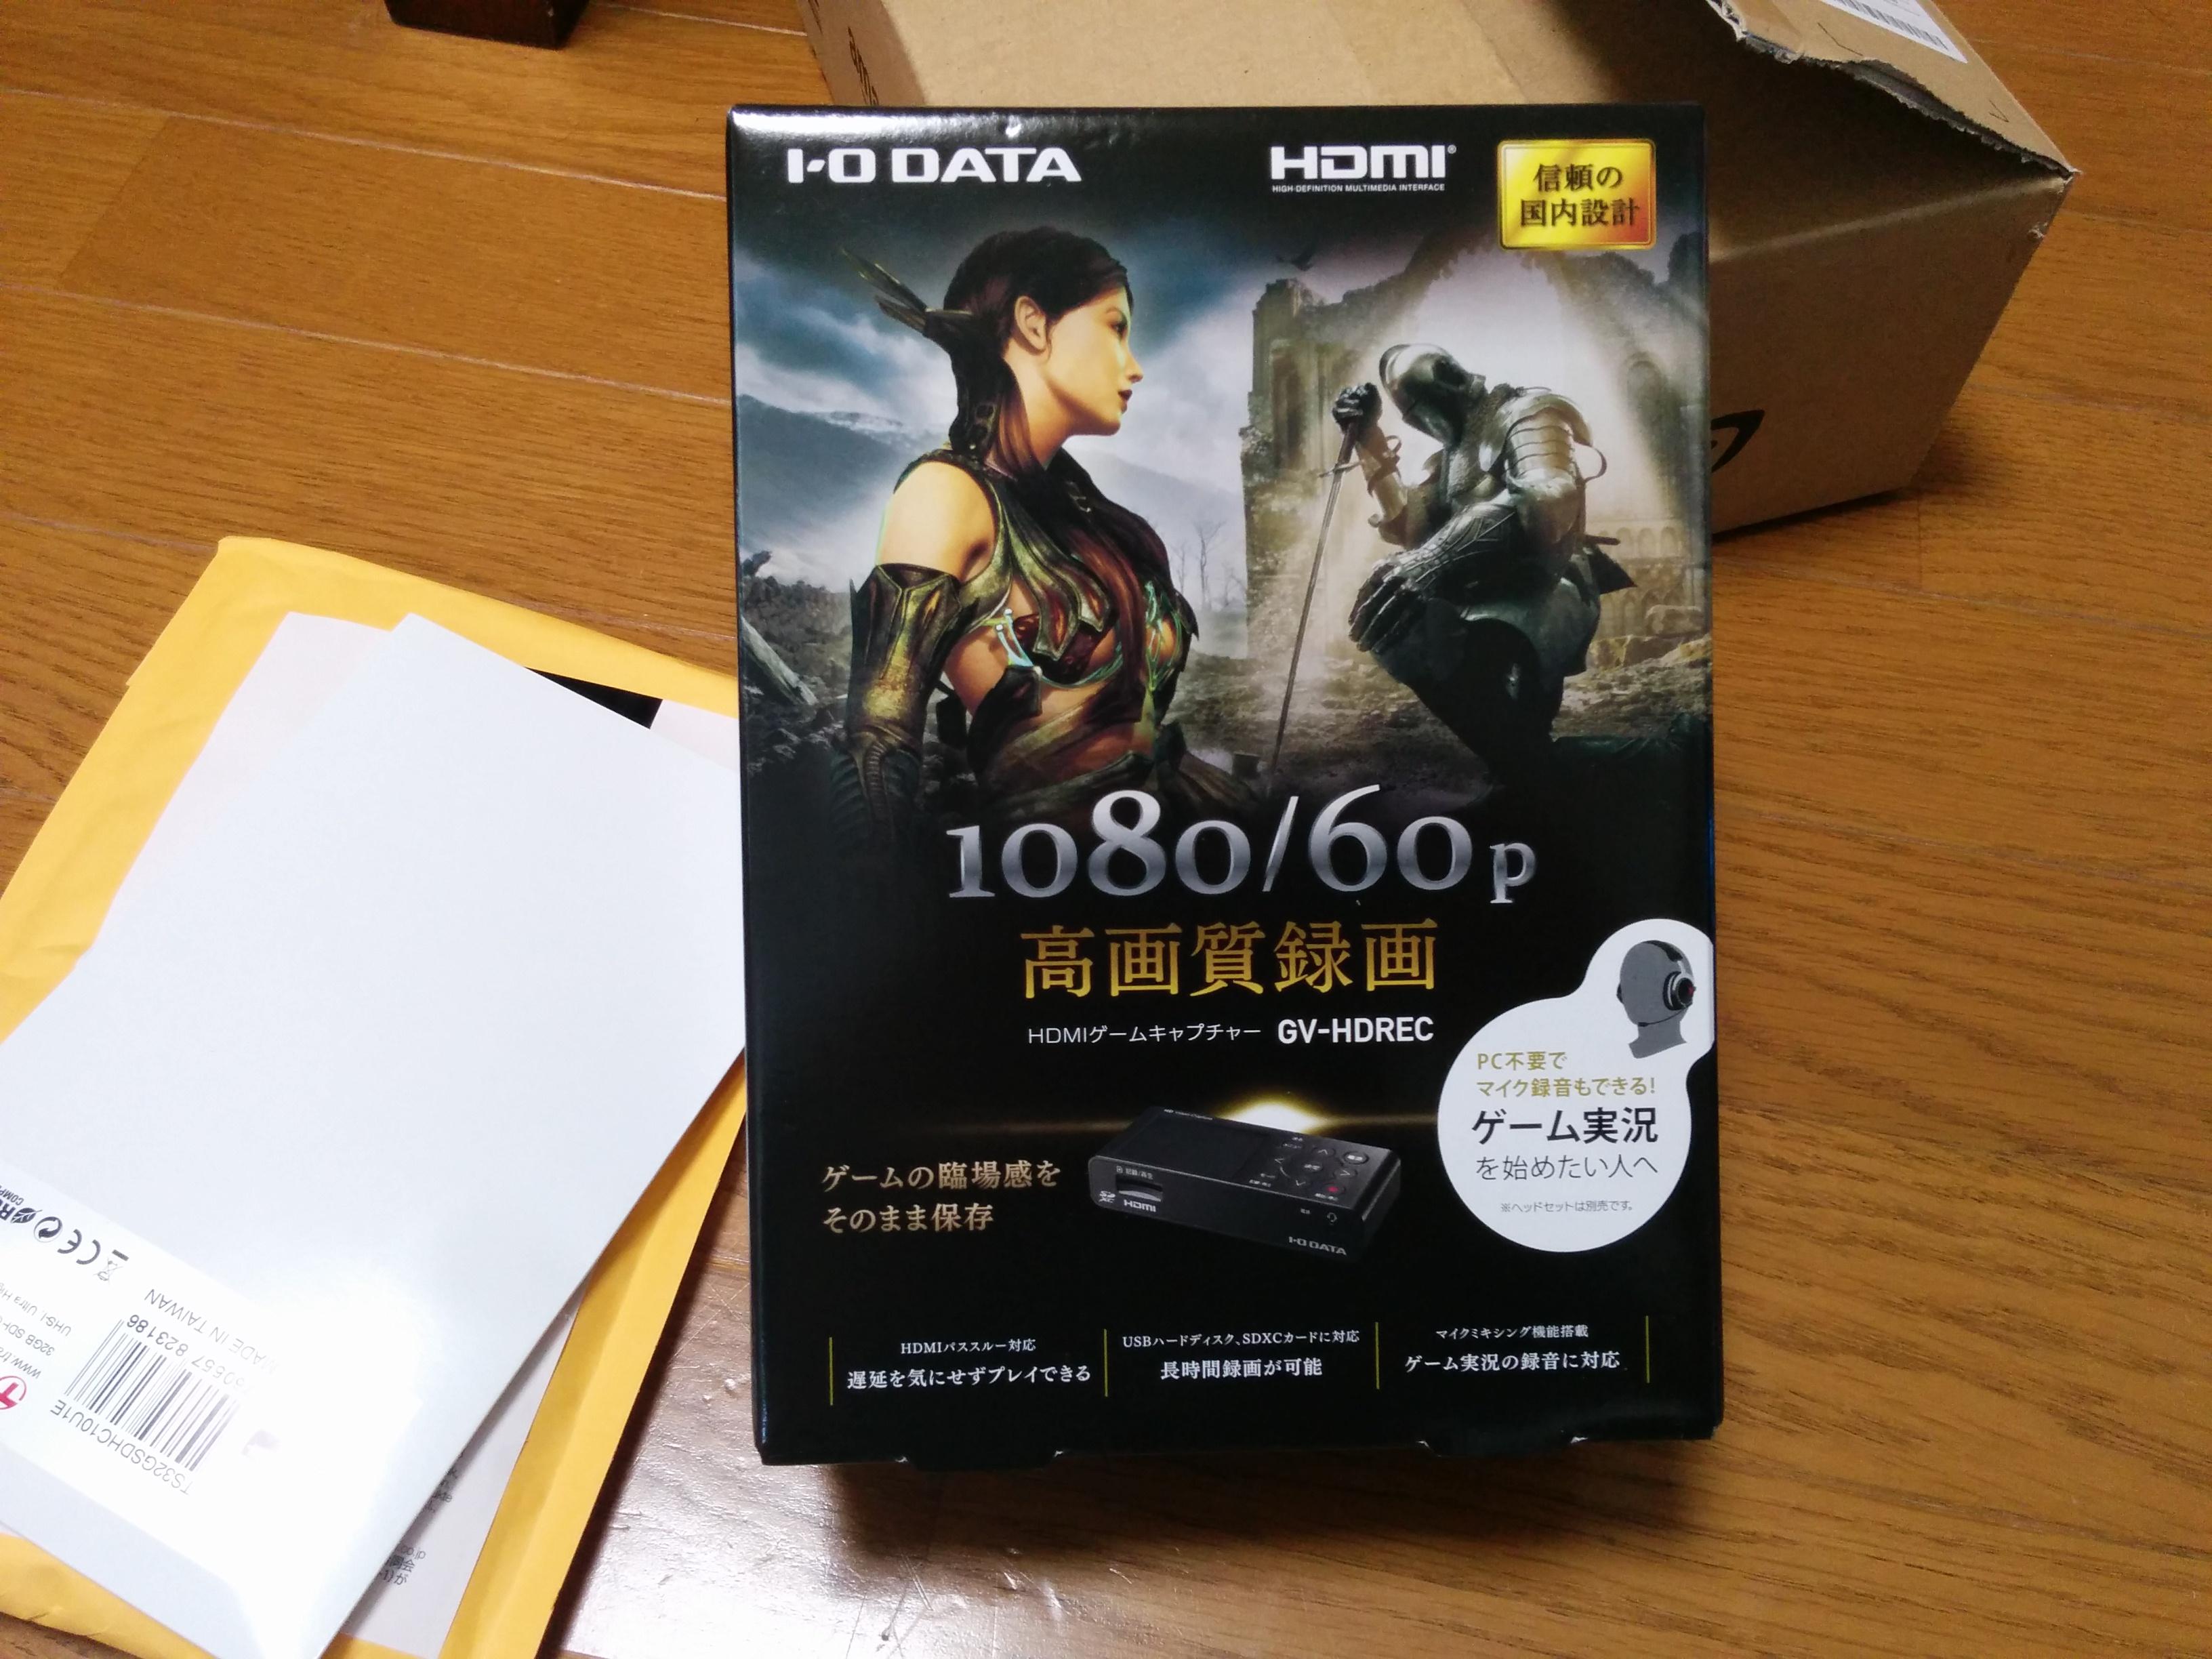 I-O DATA HDMI キャプチャーボード パソコン不要 Nintendo Switch 動作確認済 フルHD SDカード/HDD保存 GV-HDREC